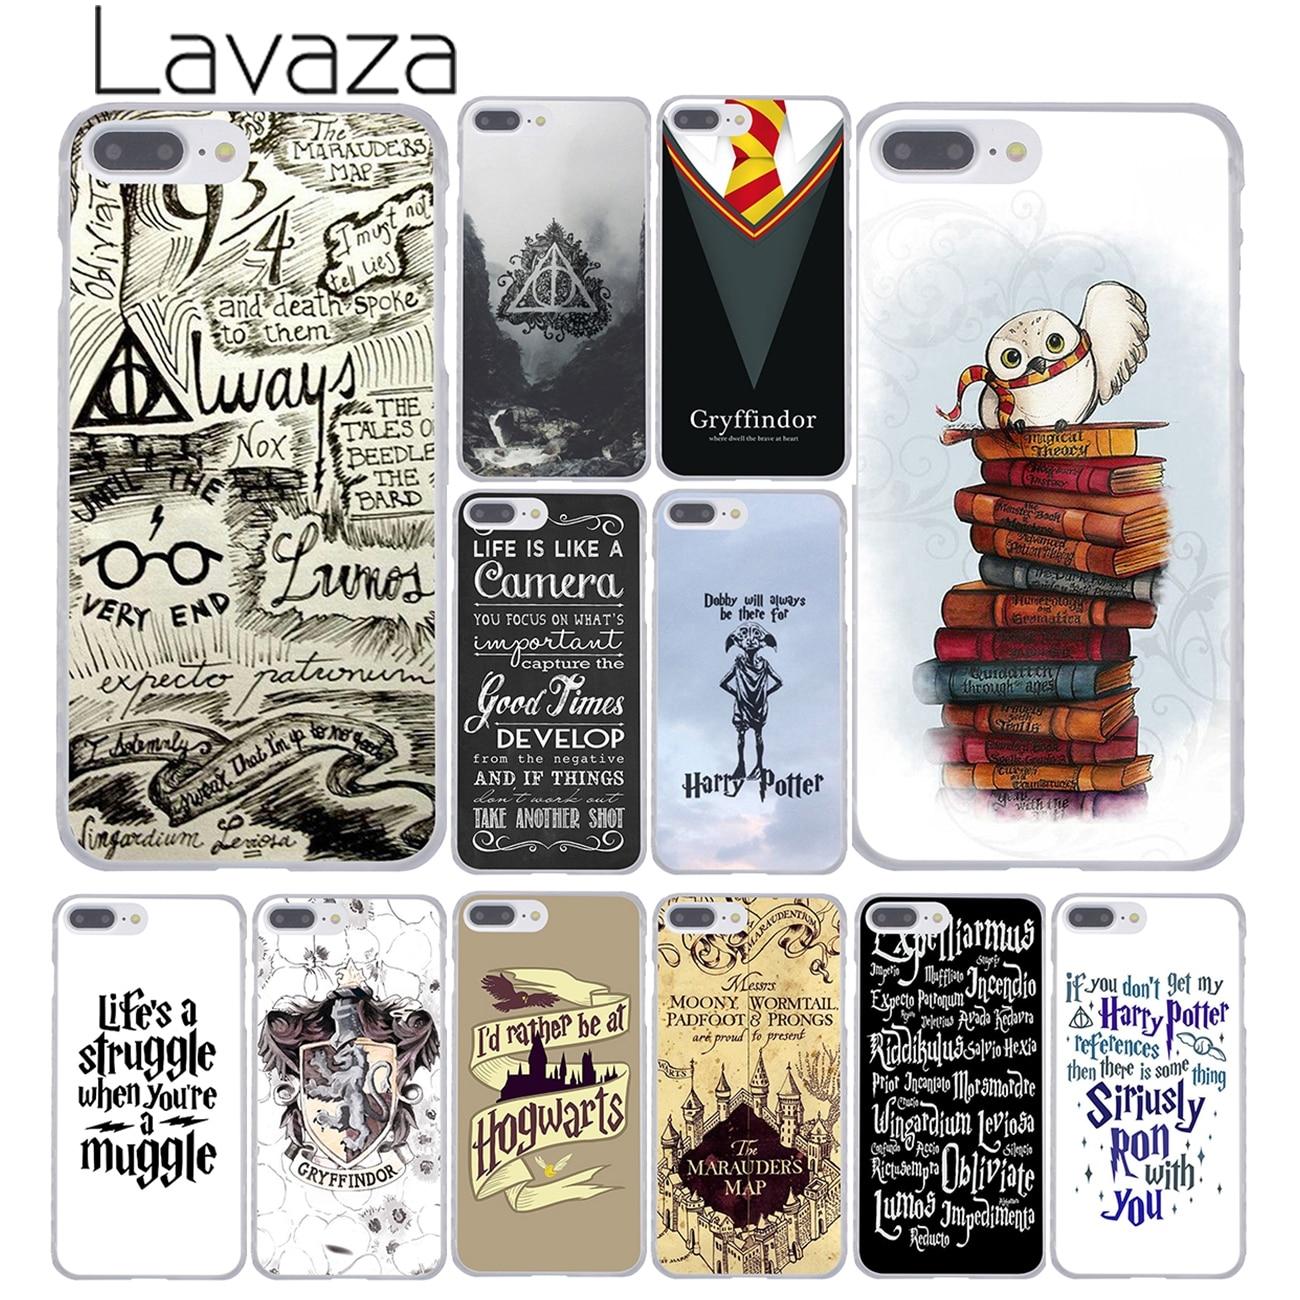 Harry Potter Book Cover Phone Case : Lavaza always harry potter deathly hallows hard phone case